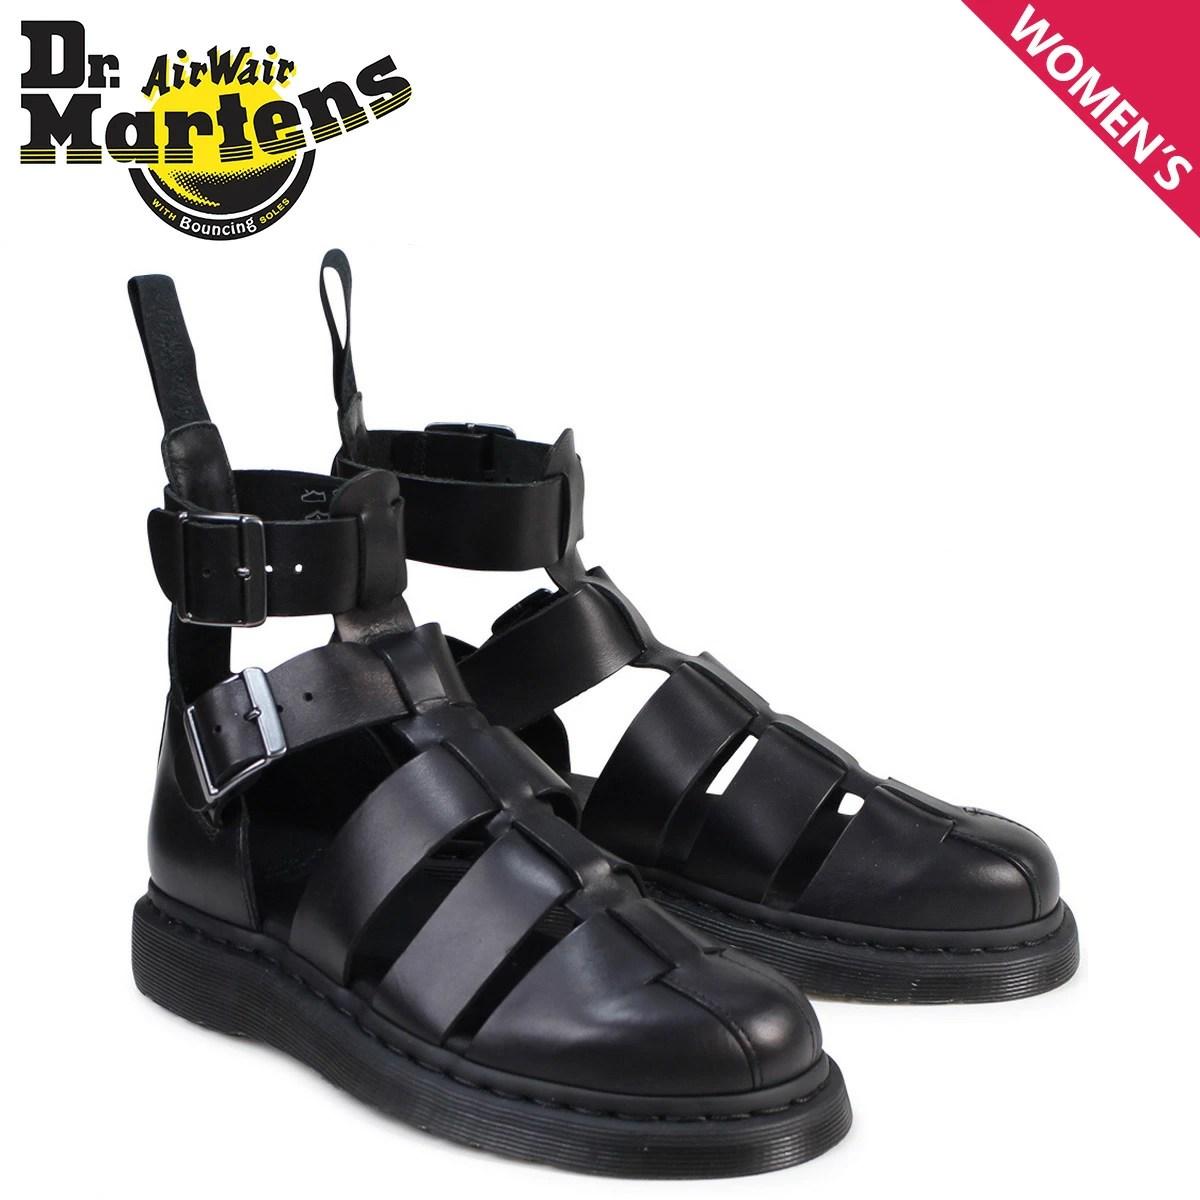 SneaK Online Shop: 博士馬丁涼鞋人分歧D Dr.Martens GERALDO STRAP SANDALS R15696001黑色[6/19補充進貨] | 日本樂天市場